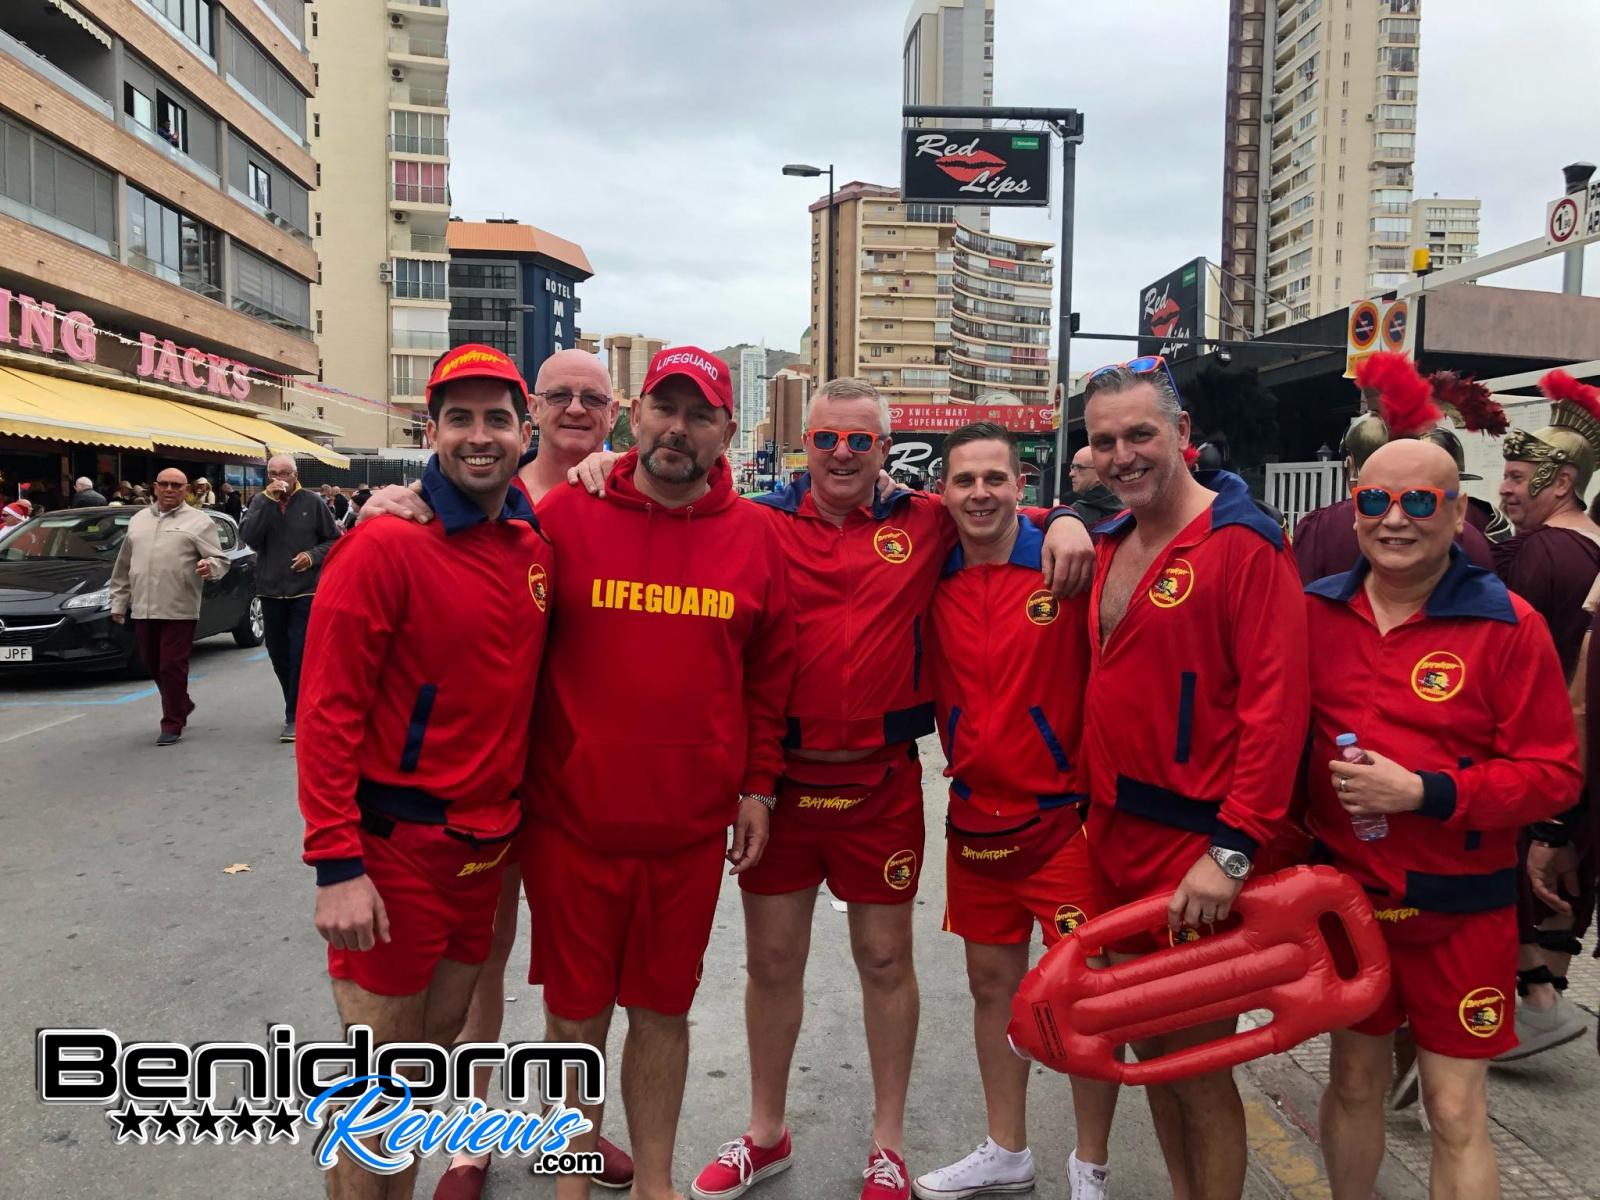 Benidorm-Fiestas-2019-Fancy-Dress-39